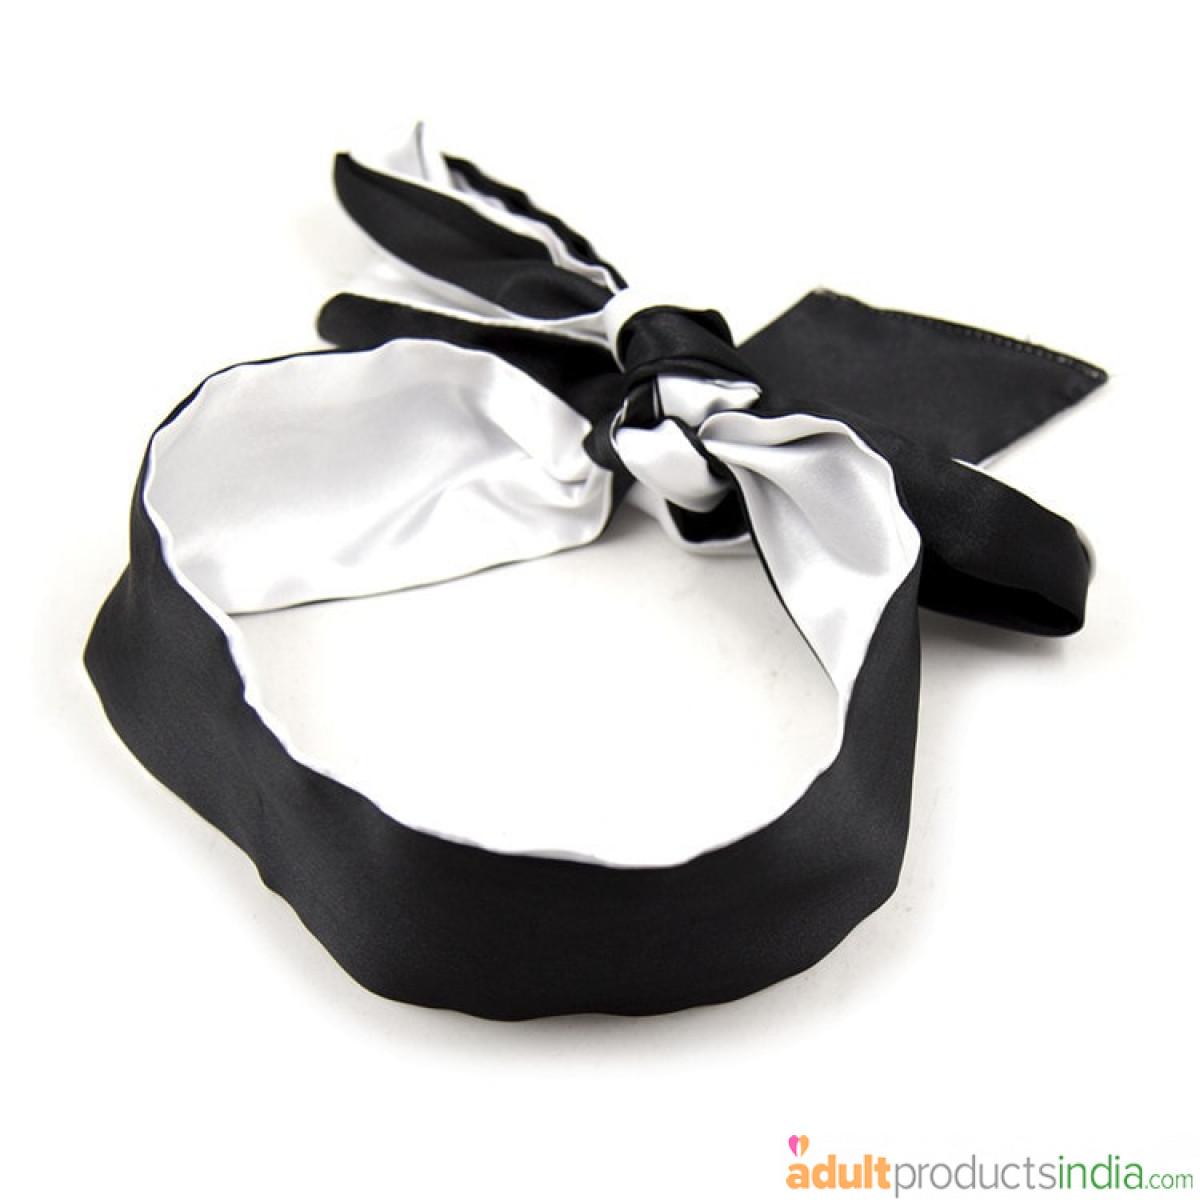 Silk Blind Fold - Black and White